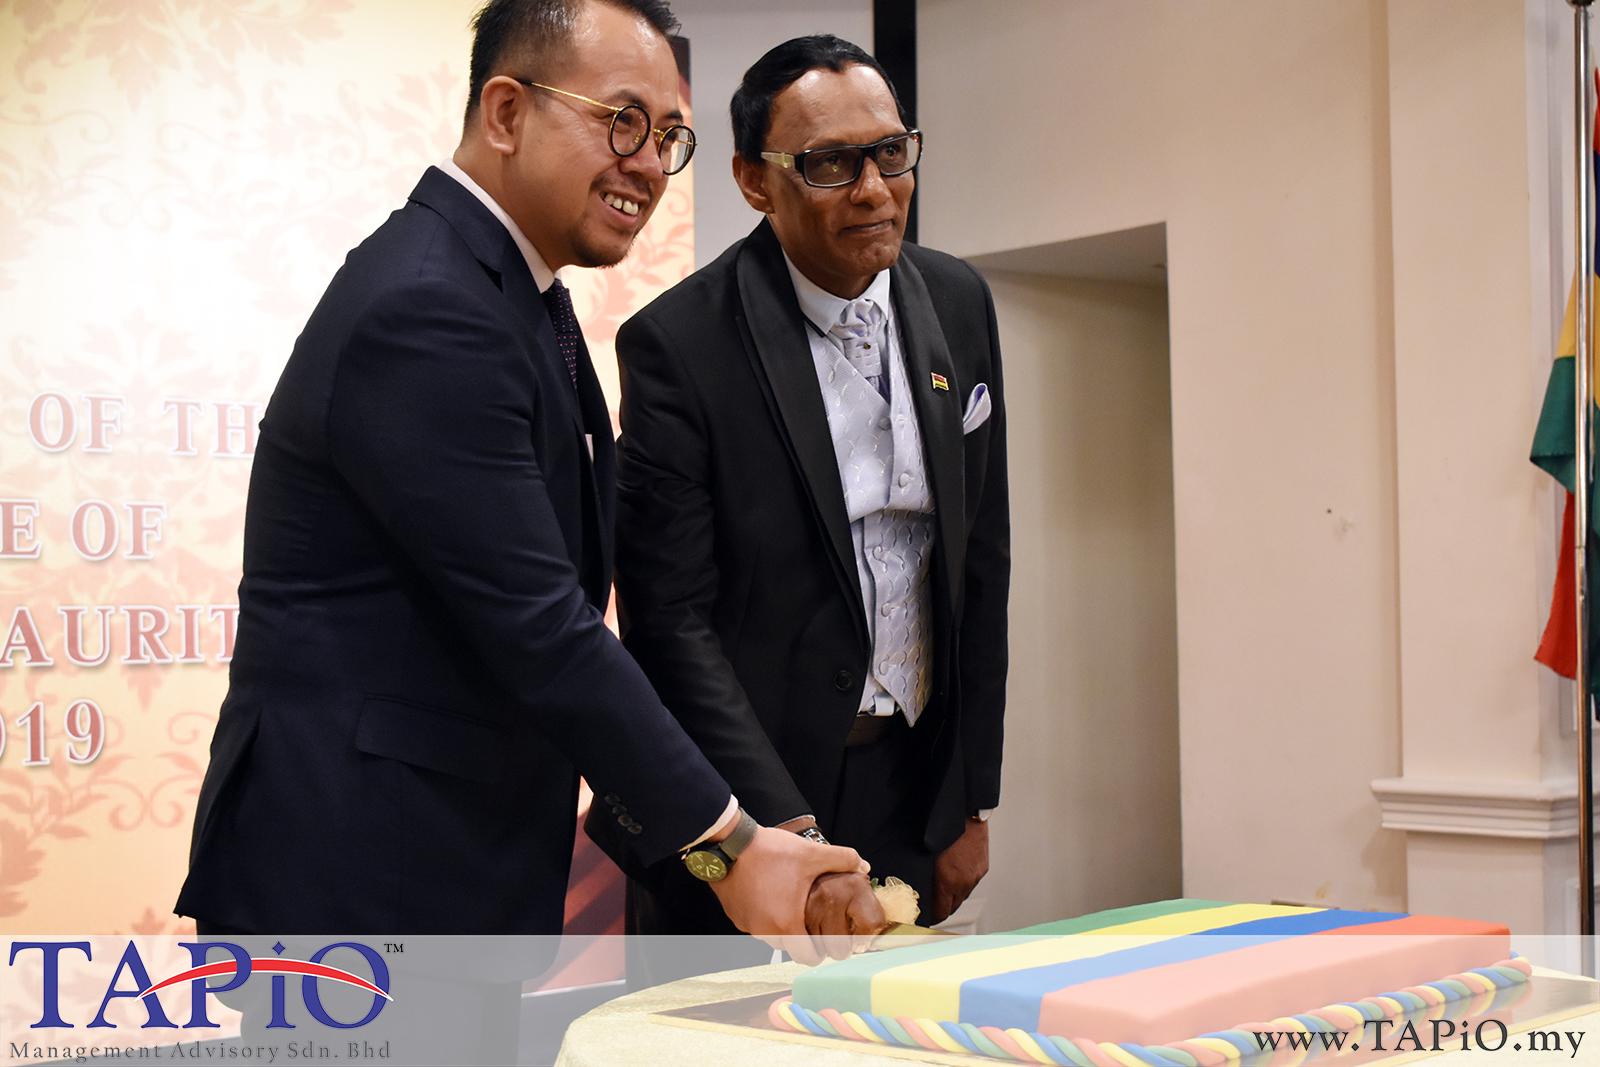 Mauritius National Day - 20/03/2019